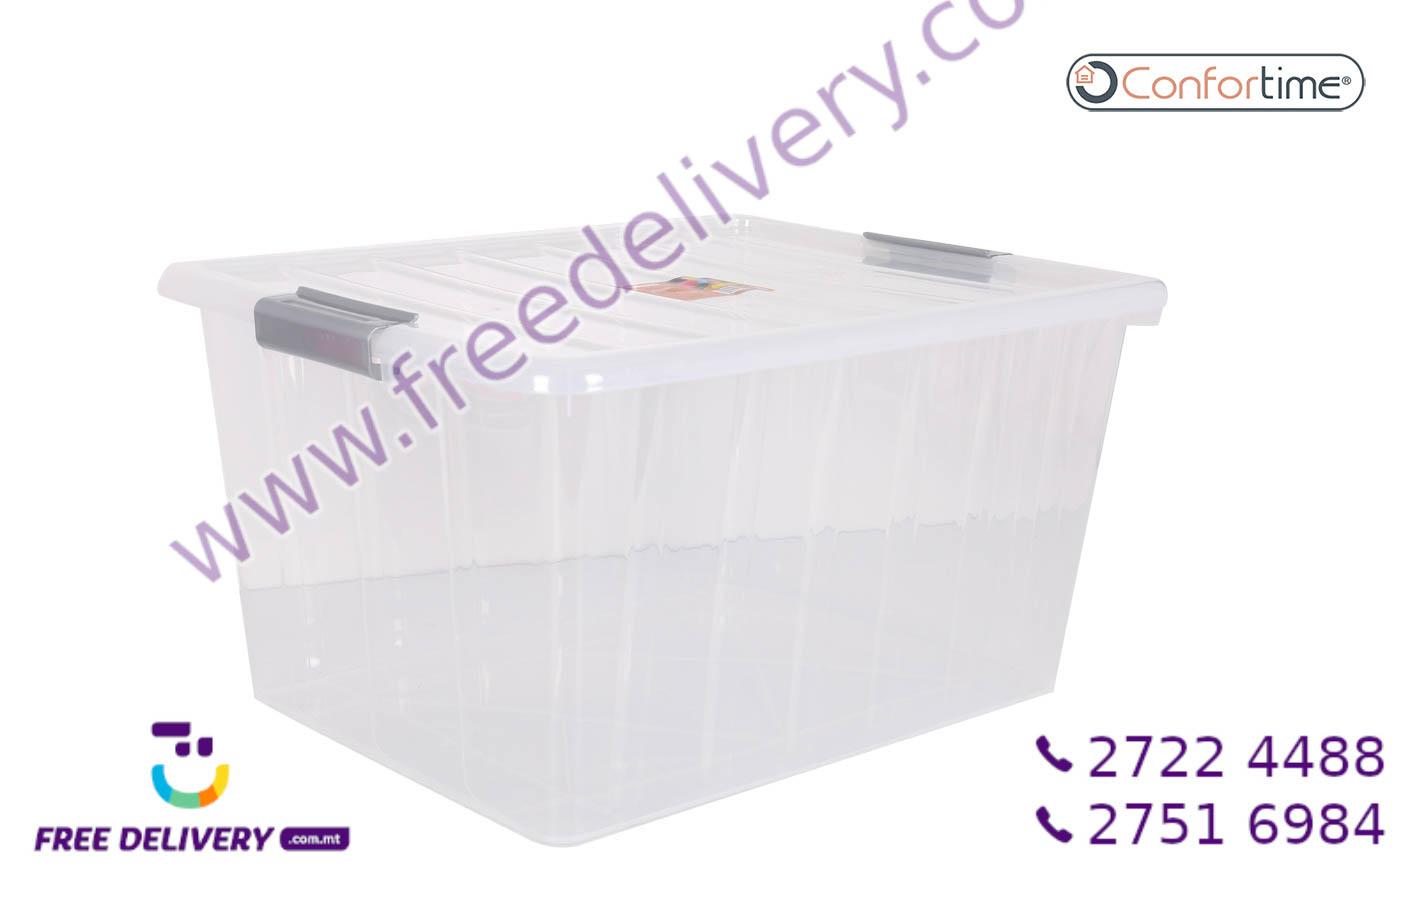 CLEAR STORAGE BOX 50L IN239340